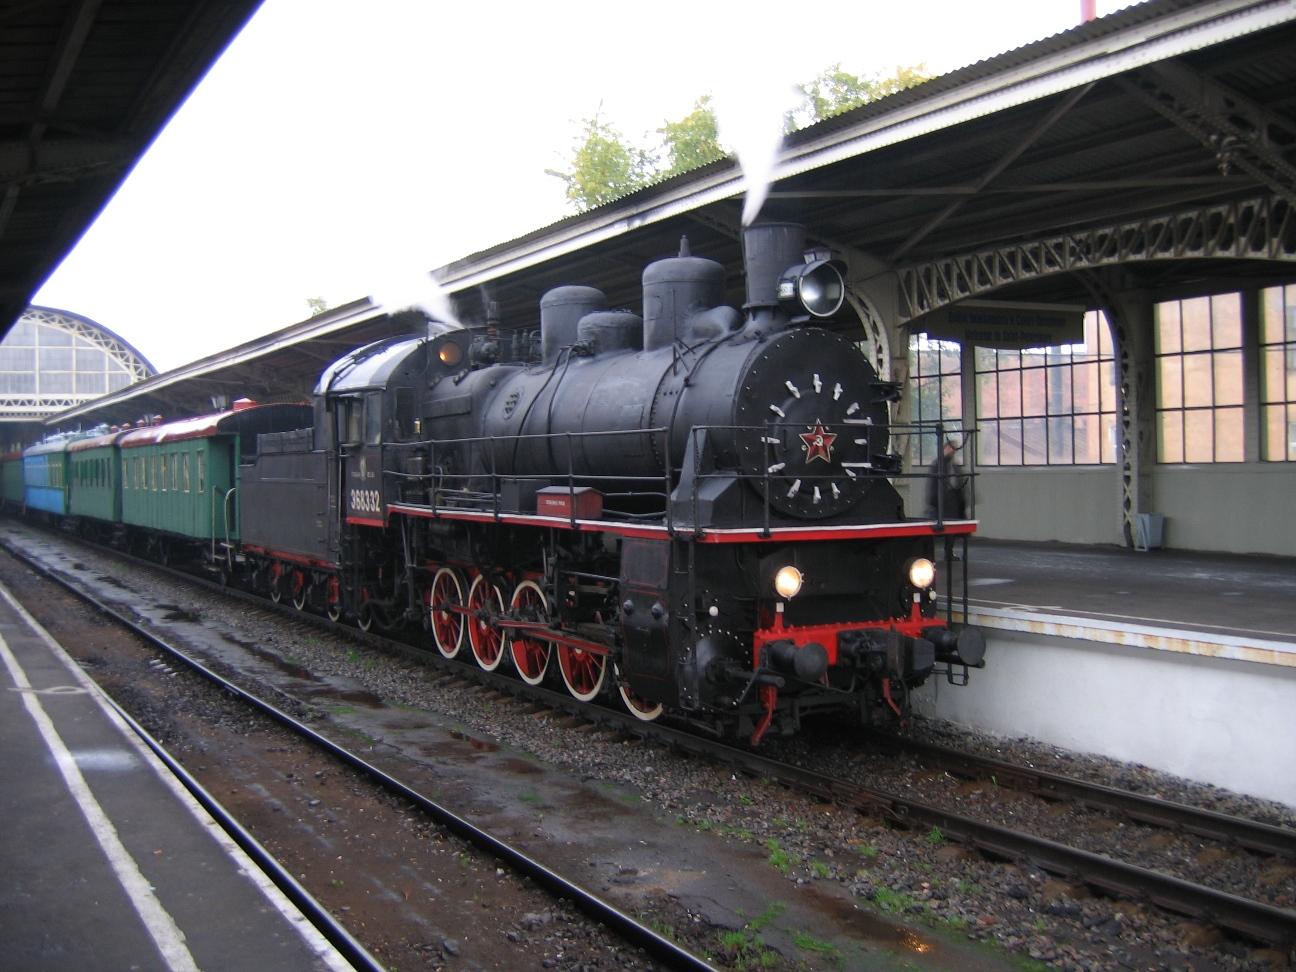 вокзале фото витебском паровоза на